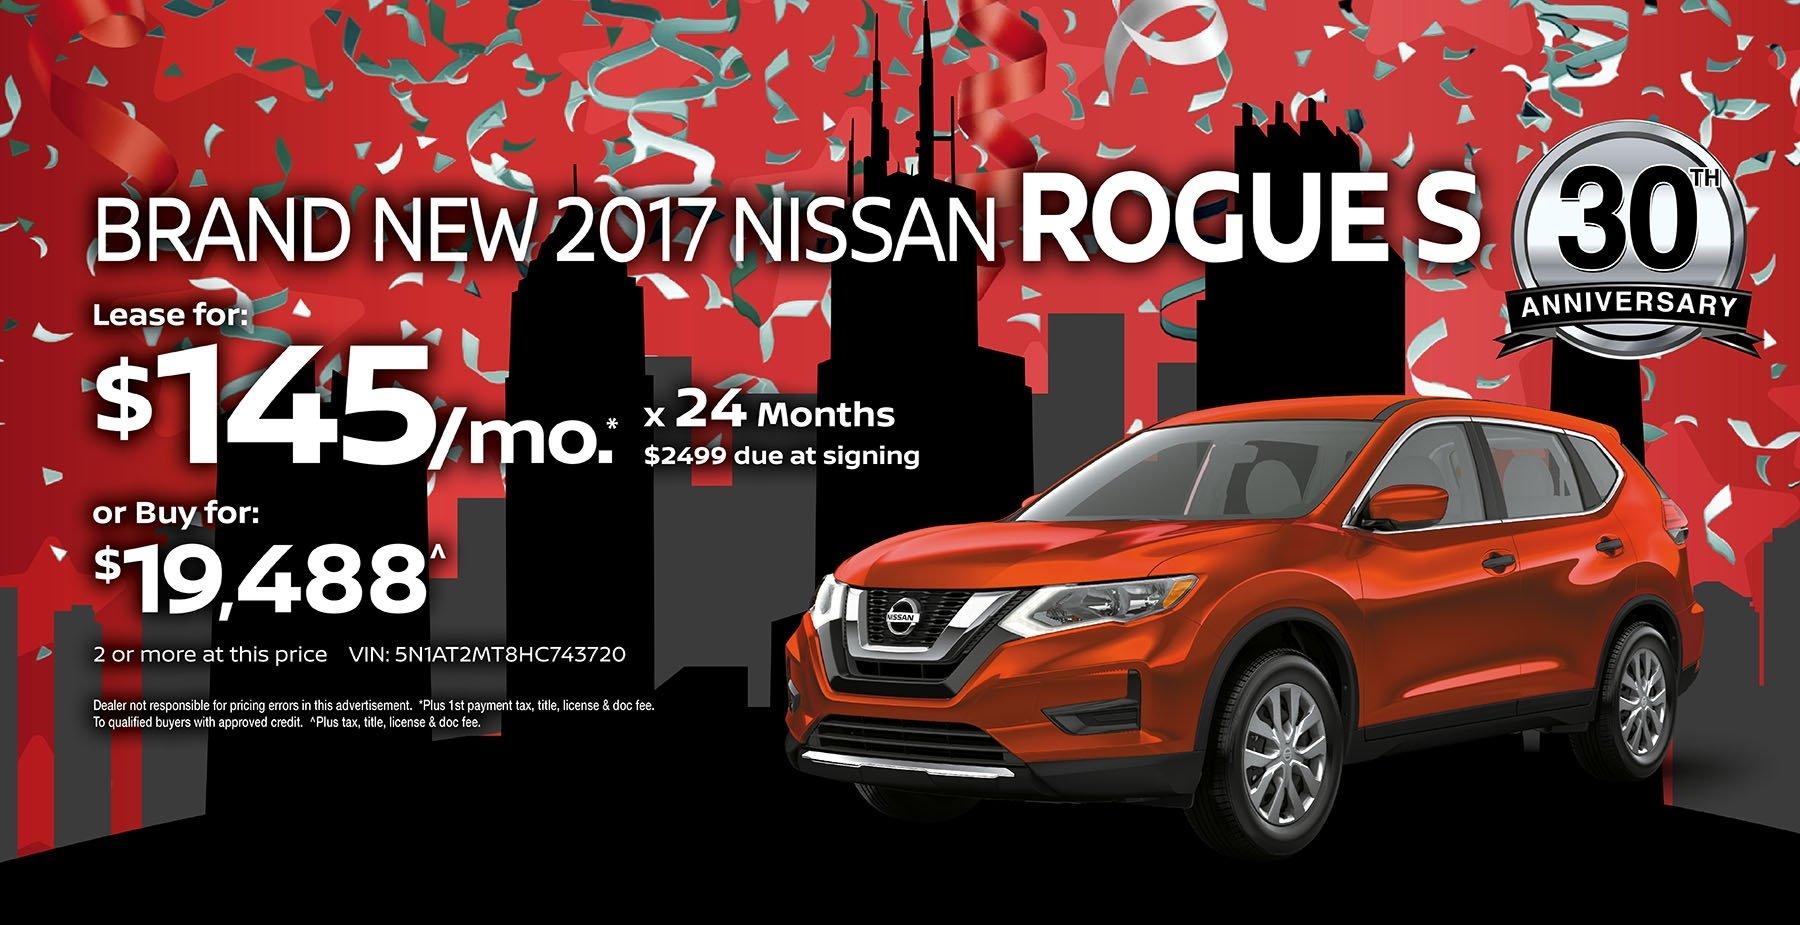 2017 Nissan Rogue June Sale at Star Nissan